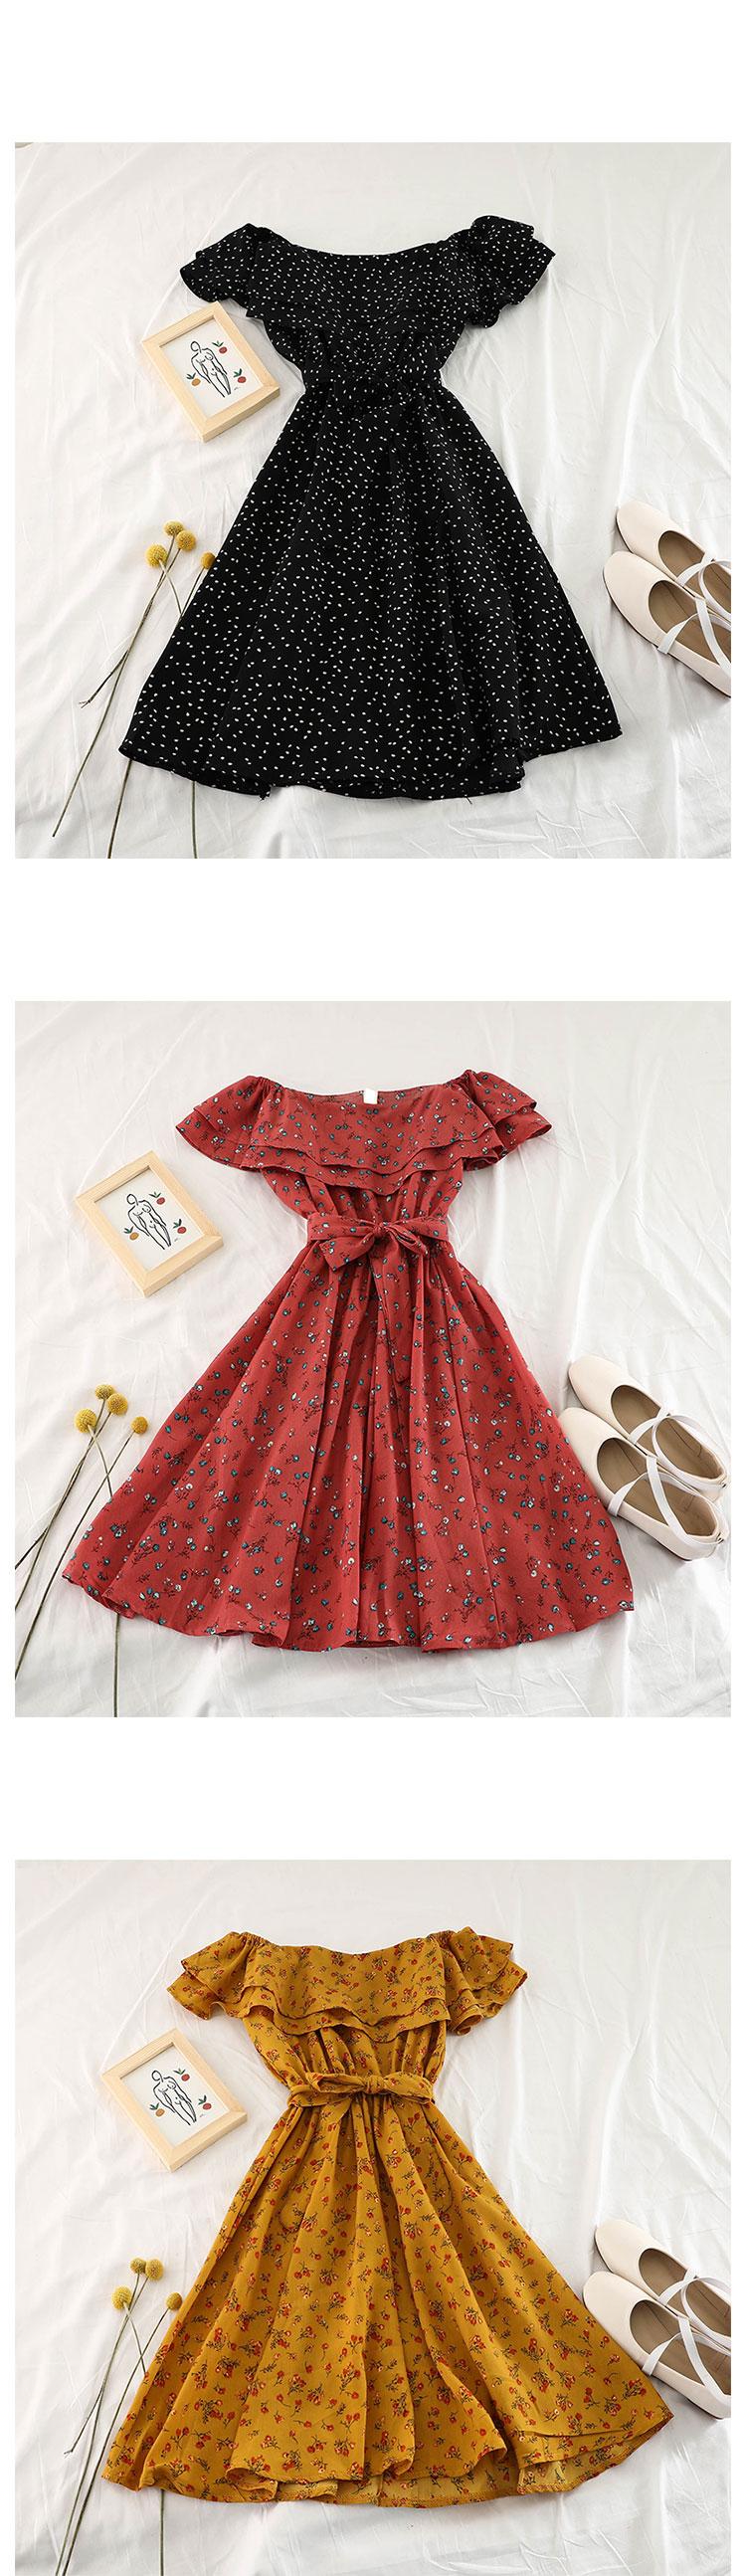 New fashion women's dresses 3